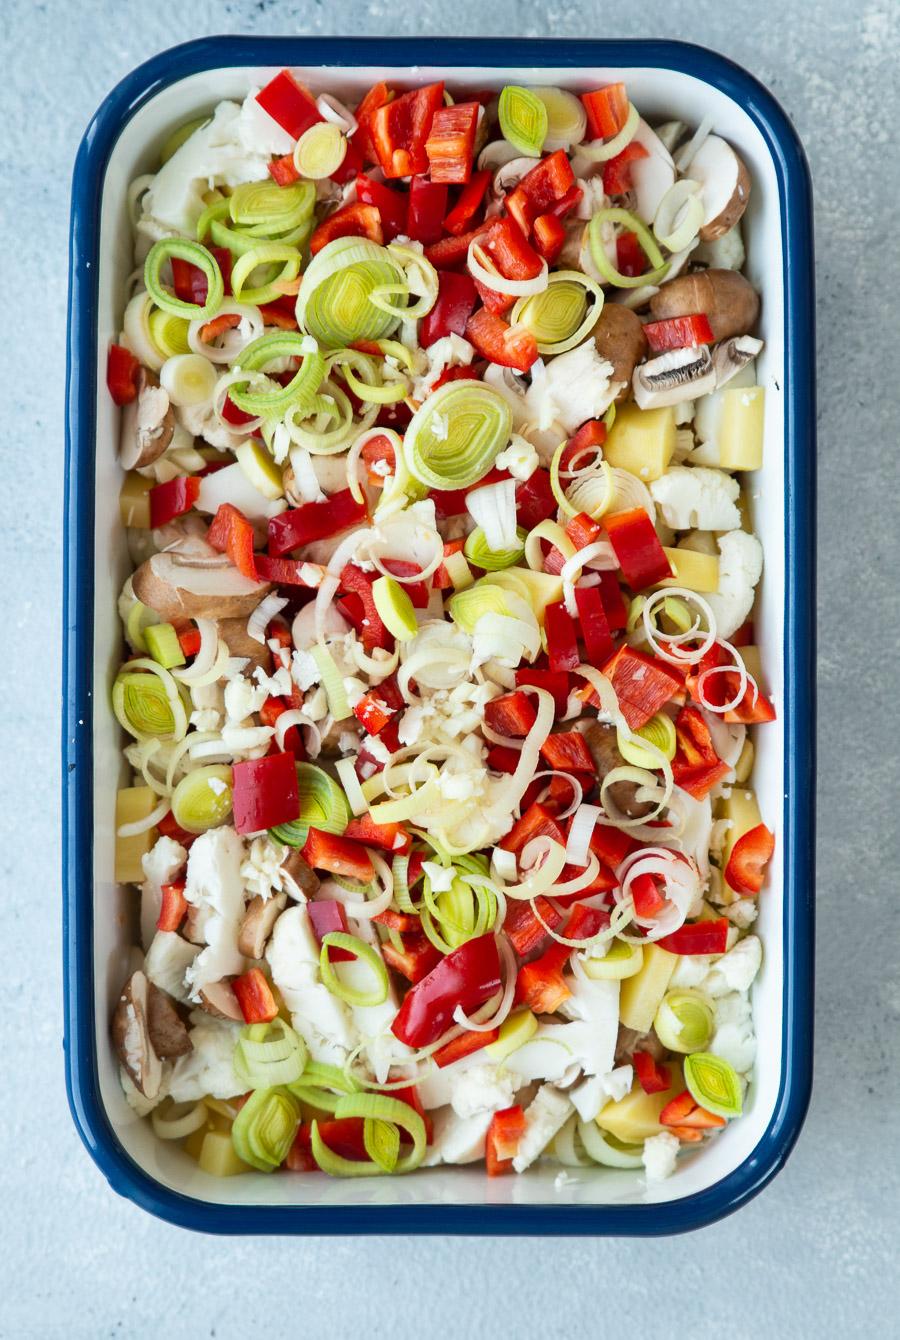 Grøntsager i pikantsauce